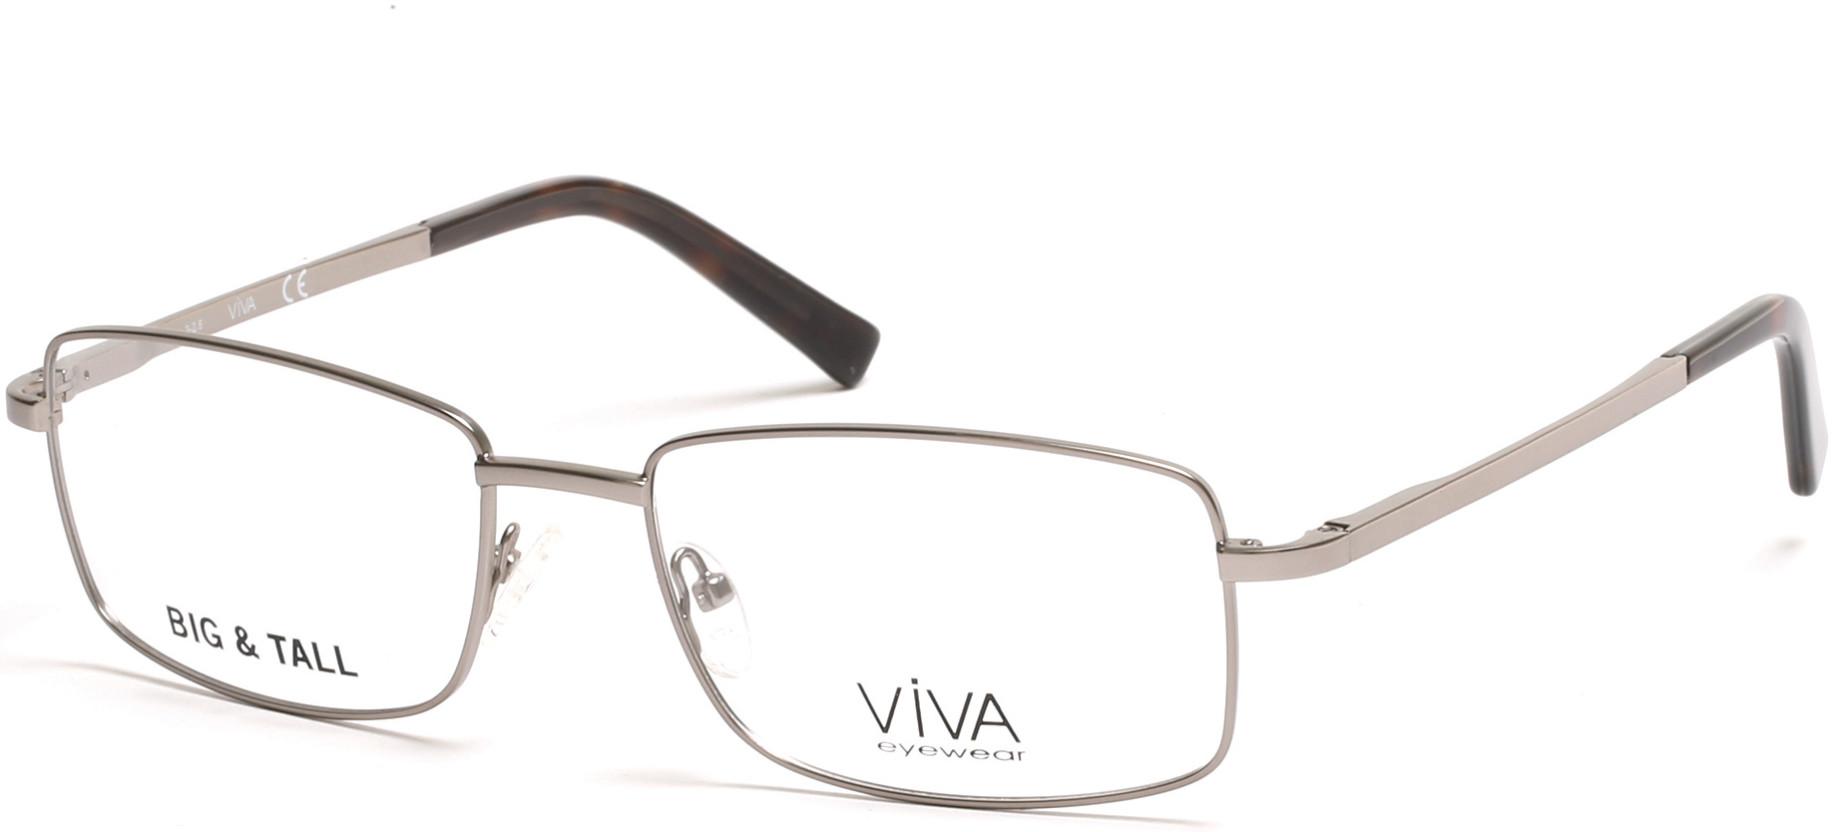 VIVA VV4005 style-color 009 - Matte Gunmetal